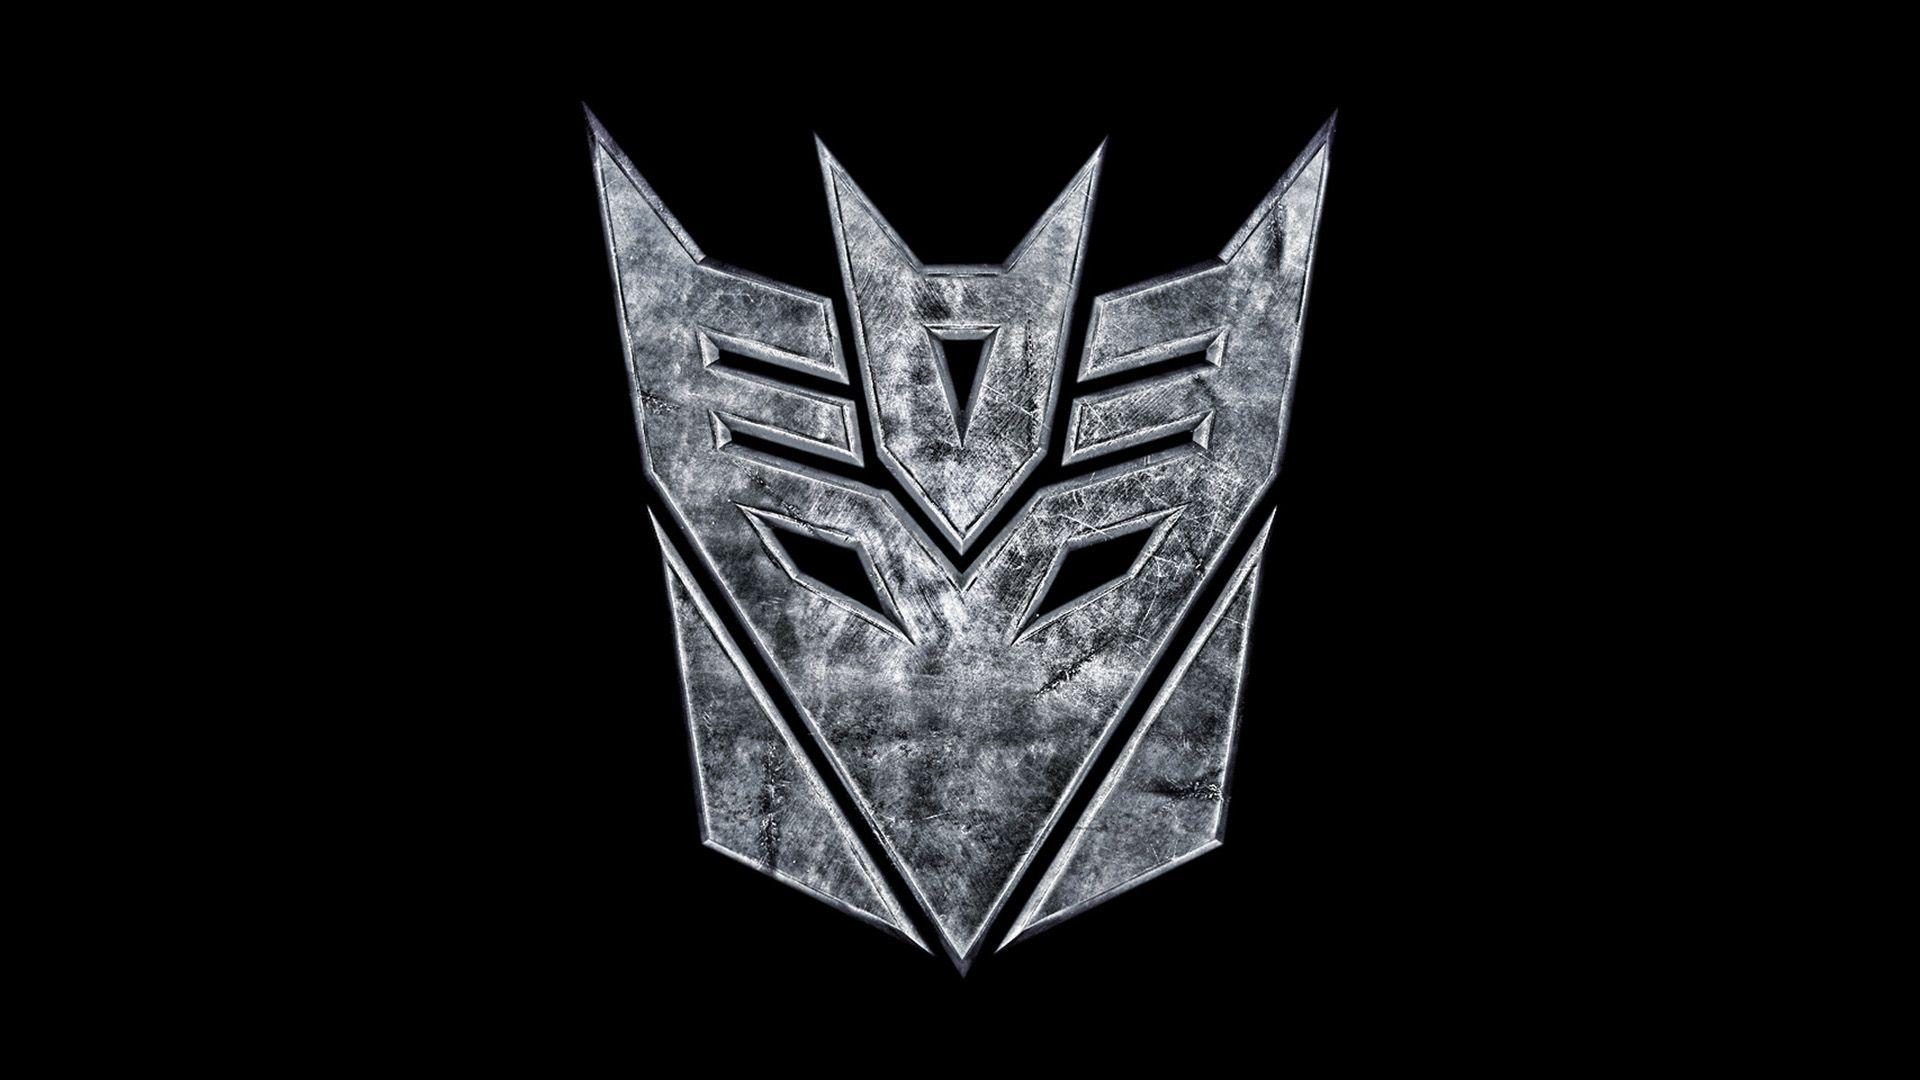 Transformers Autobot And Decepticon Logo 7 Wallpaper Background Hd